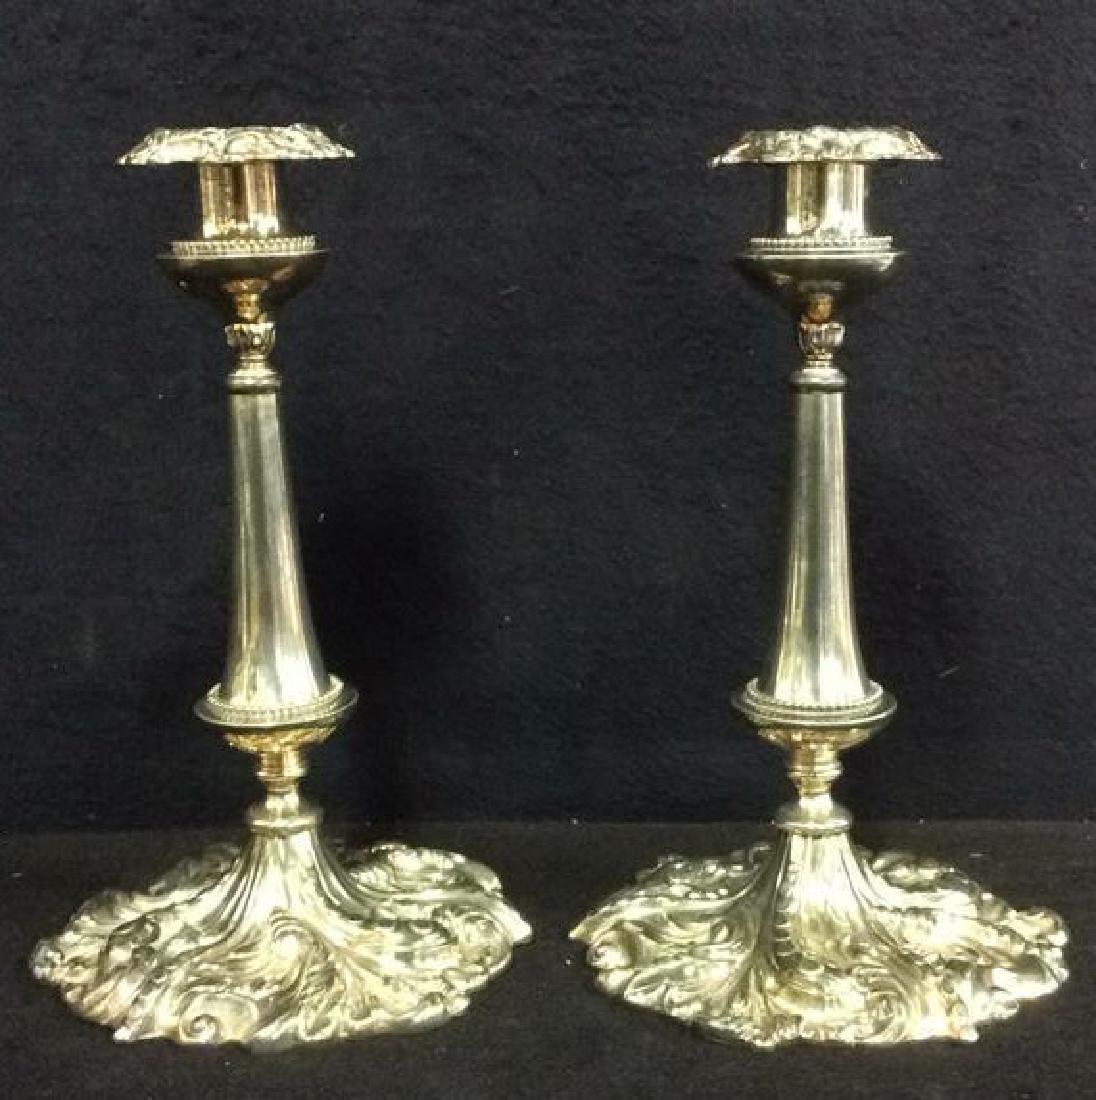 Pr VICTOR SILVER CO Ornately Detailed Candlesticks